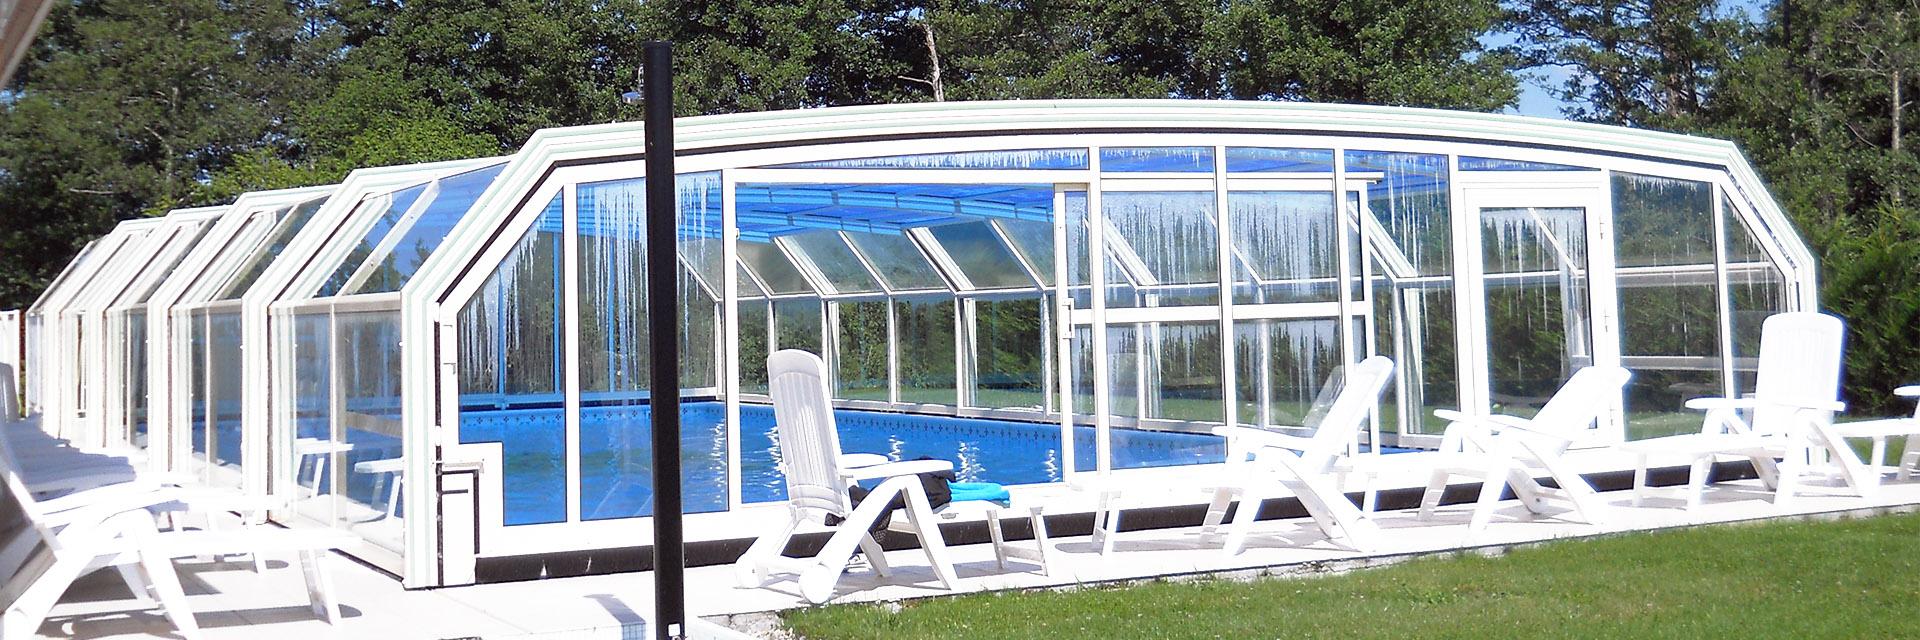 Village_club_vacances_gers-et-aquitaine-tournesols-du-gers-piscine